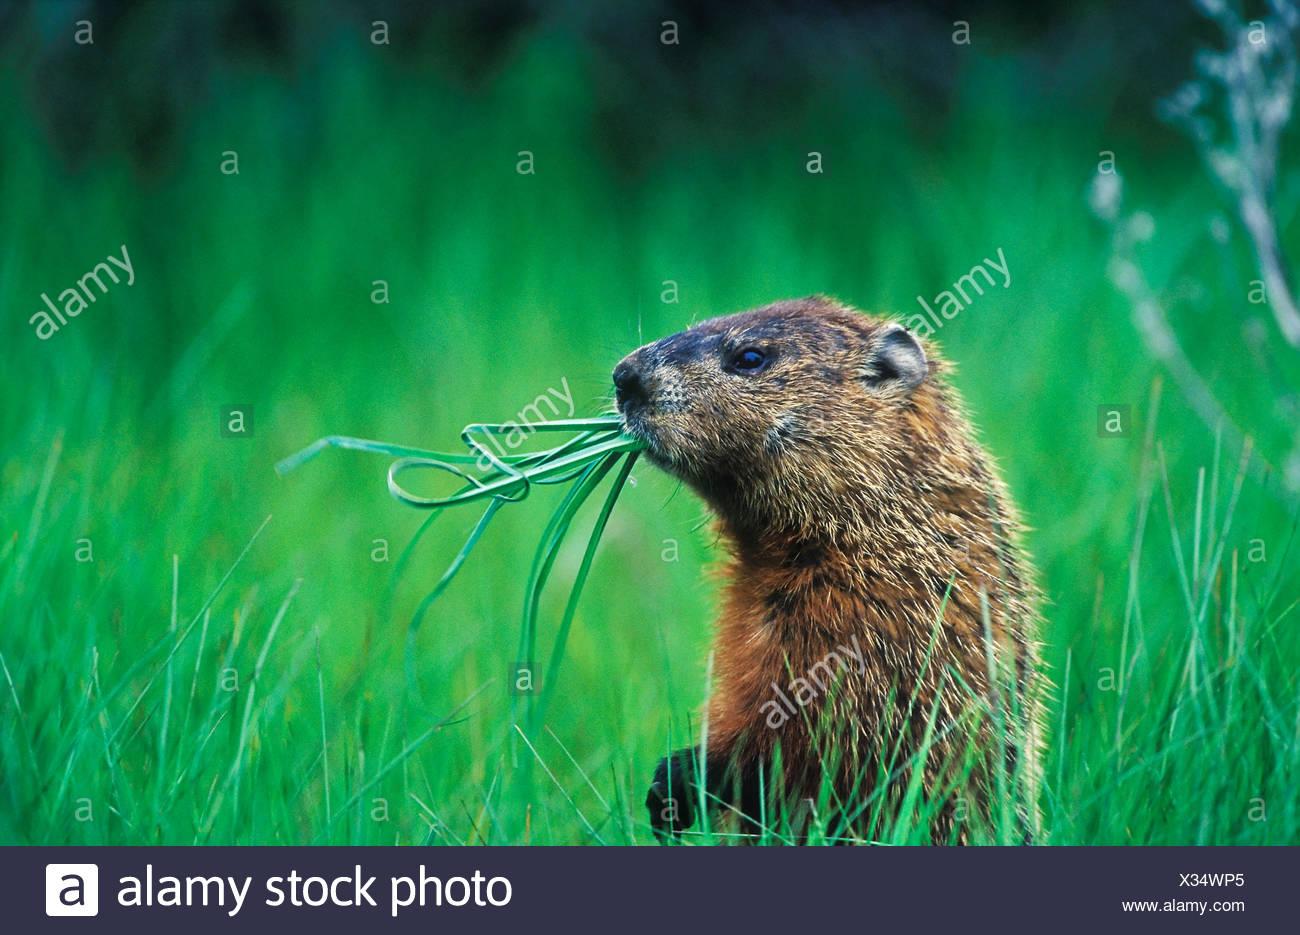 Woodchuck (Groundhog) (Marmota monax) chewing on grass while it looks around Prince Edward Point National Wildlife Area Ontario - Stock Image